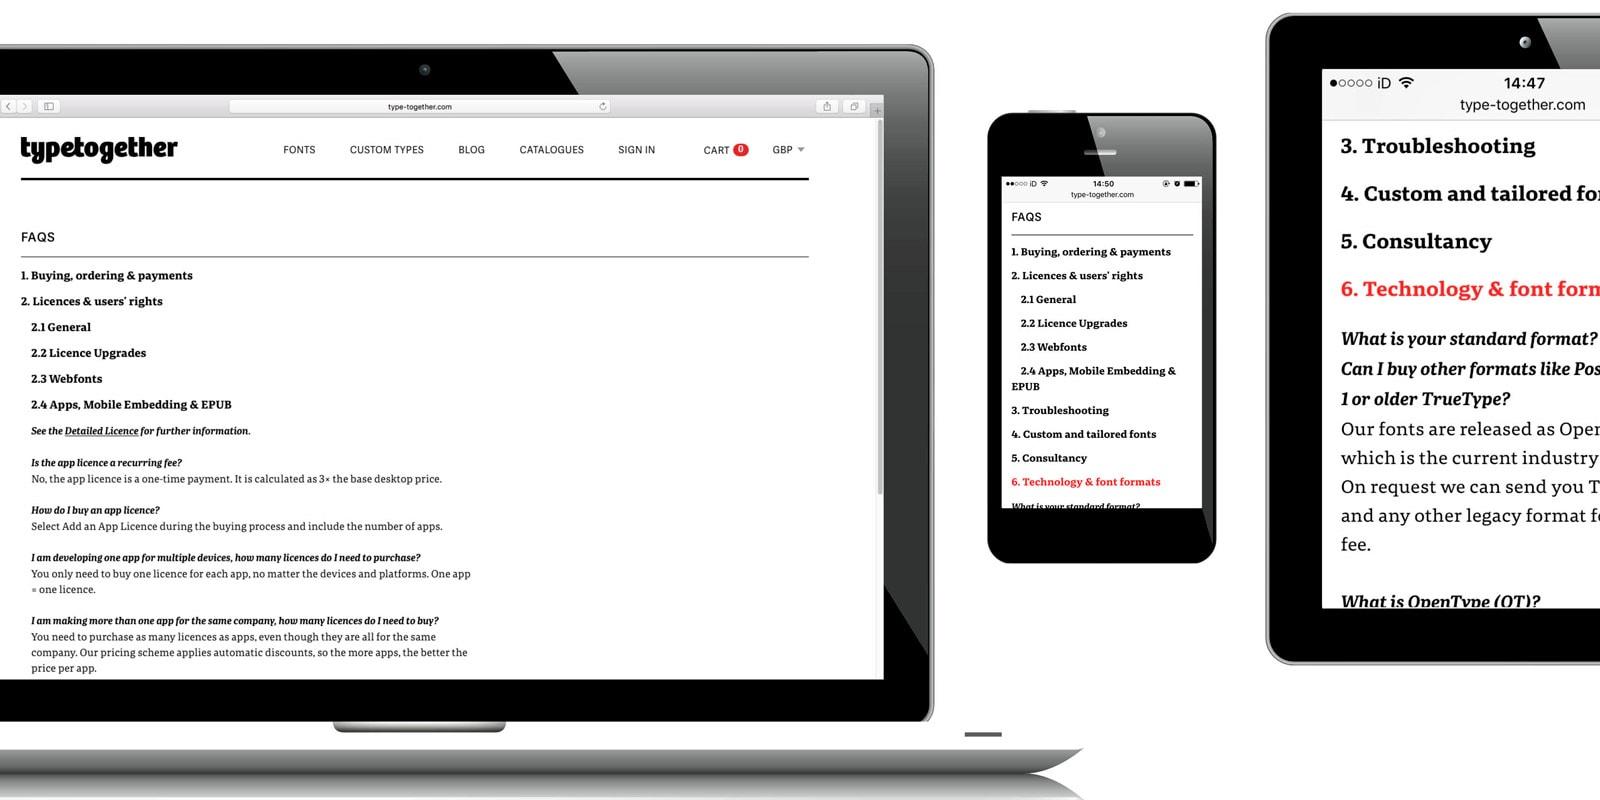 TypeTogether Website FAQ